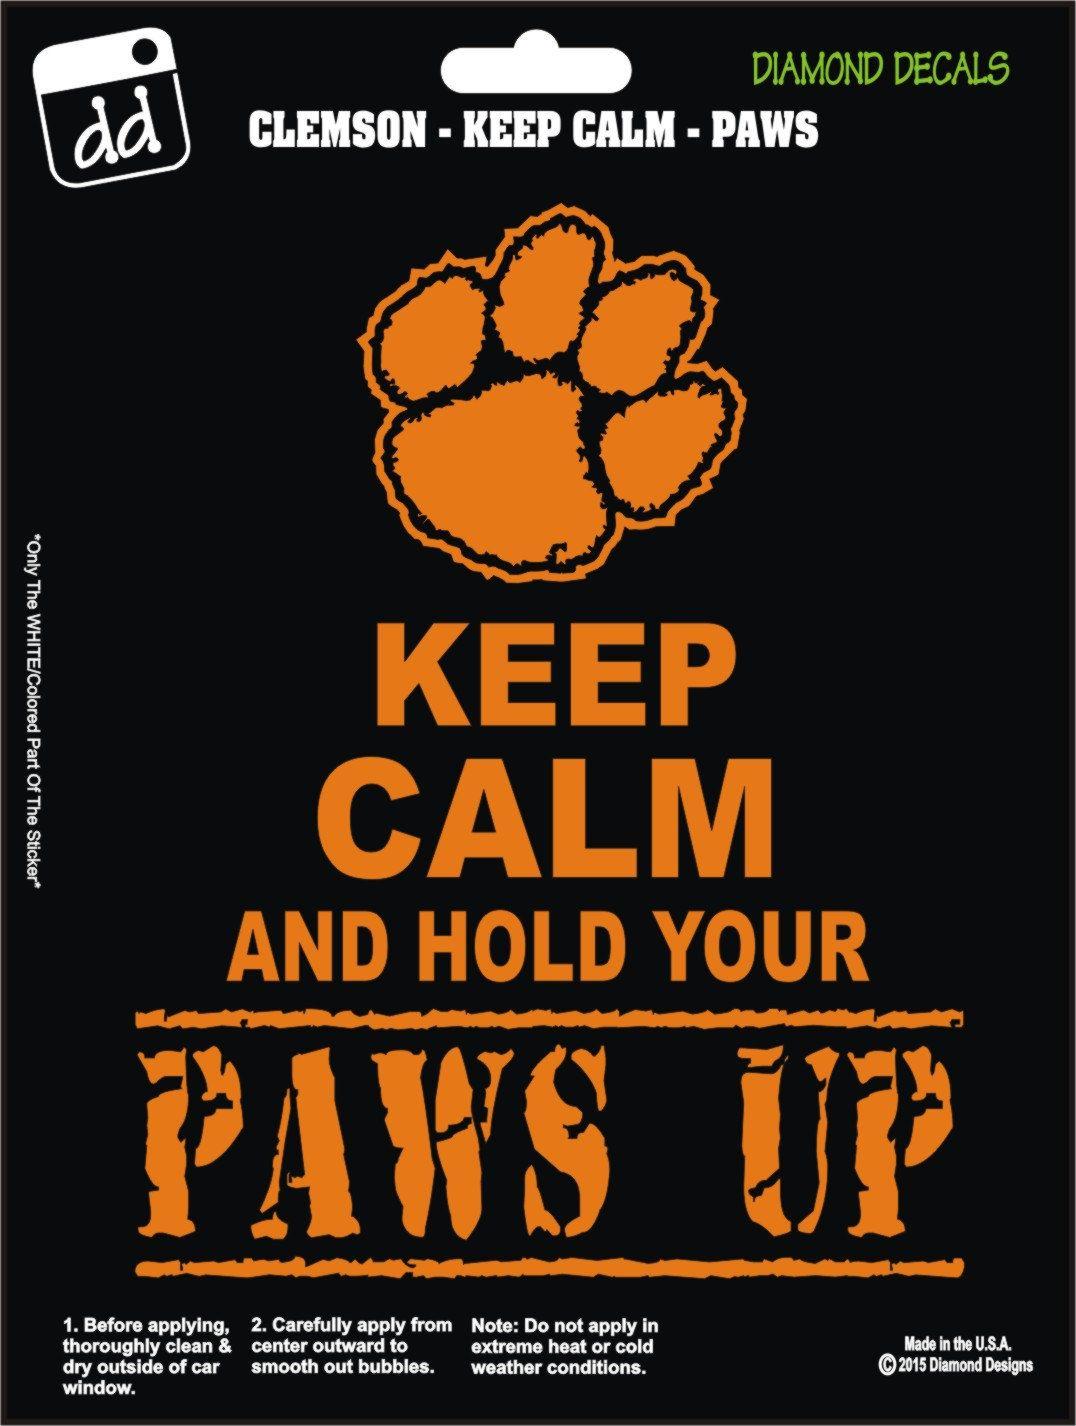 Clemson Tigers Paw Keep Calm Decal Vinyl Sticker Car Truck Laptop Suv Window Clemson Tiger Paw Tiger Paw Clemson [ 1426 x 1076 Pixel ]